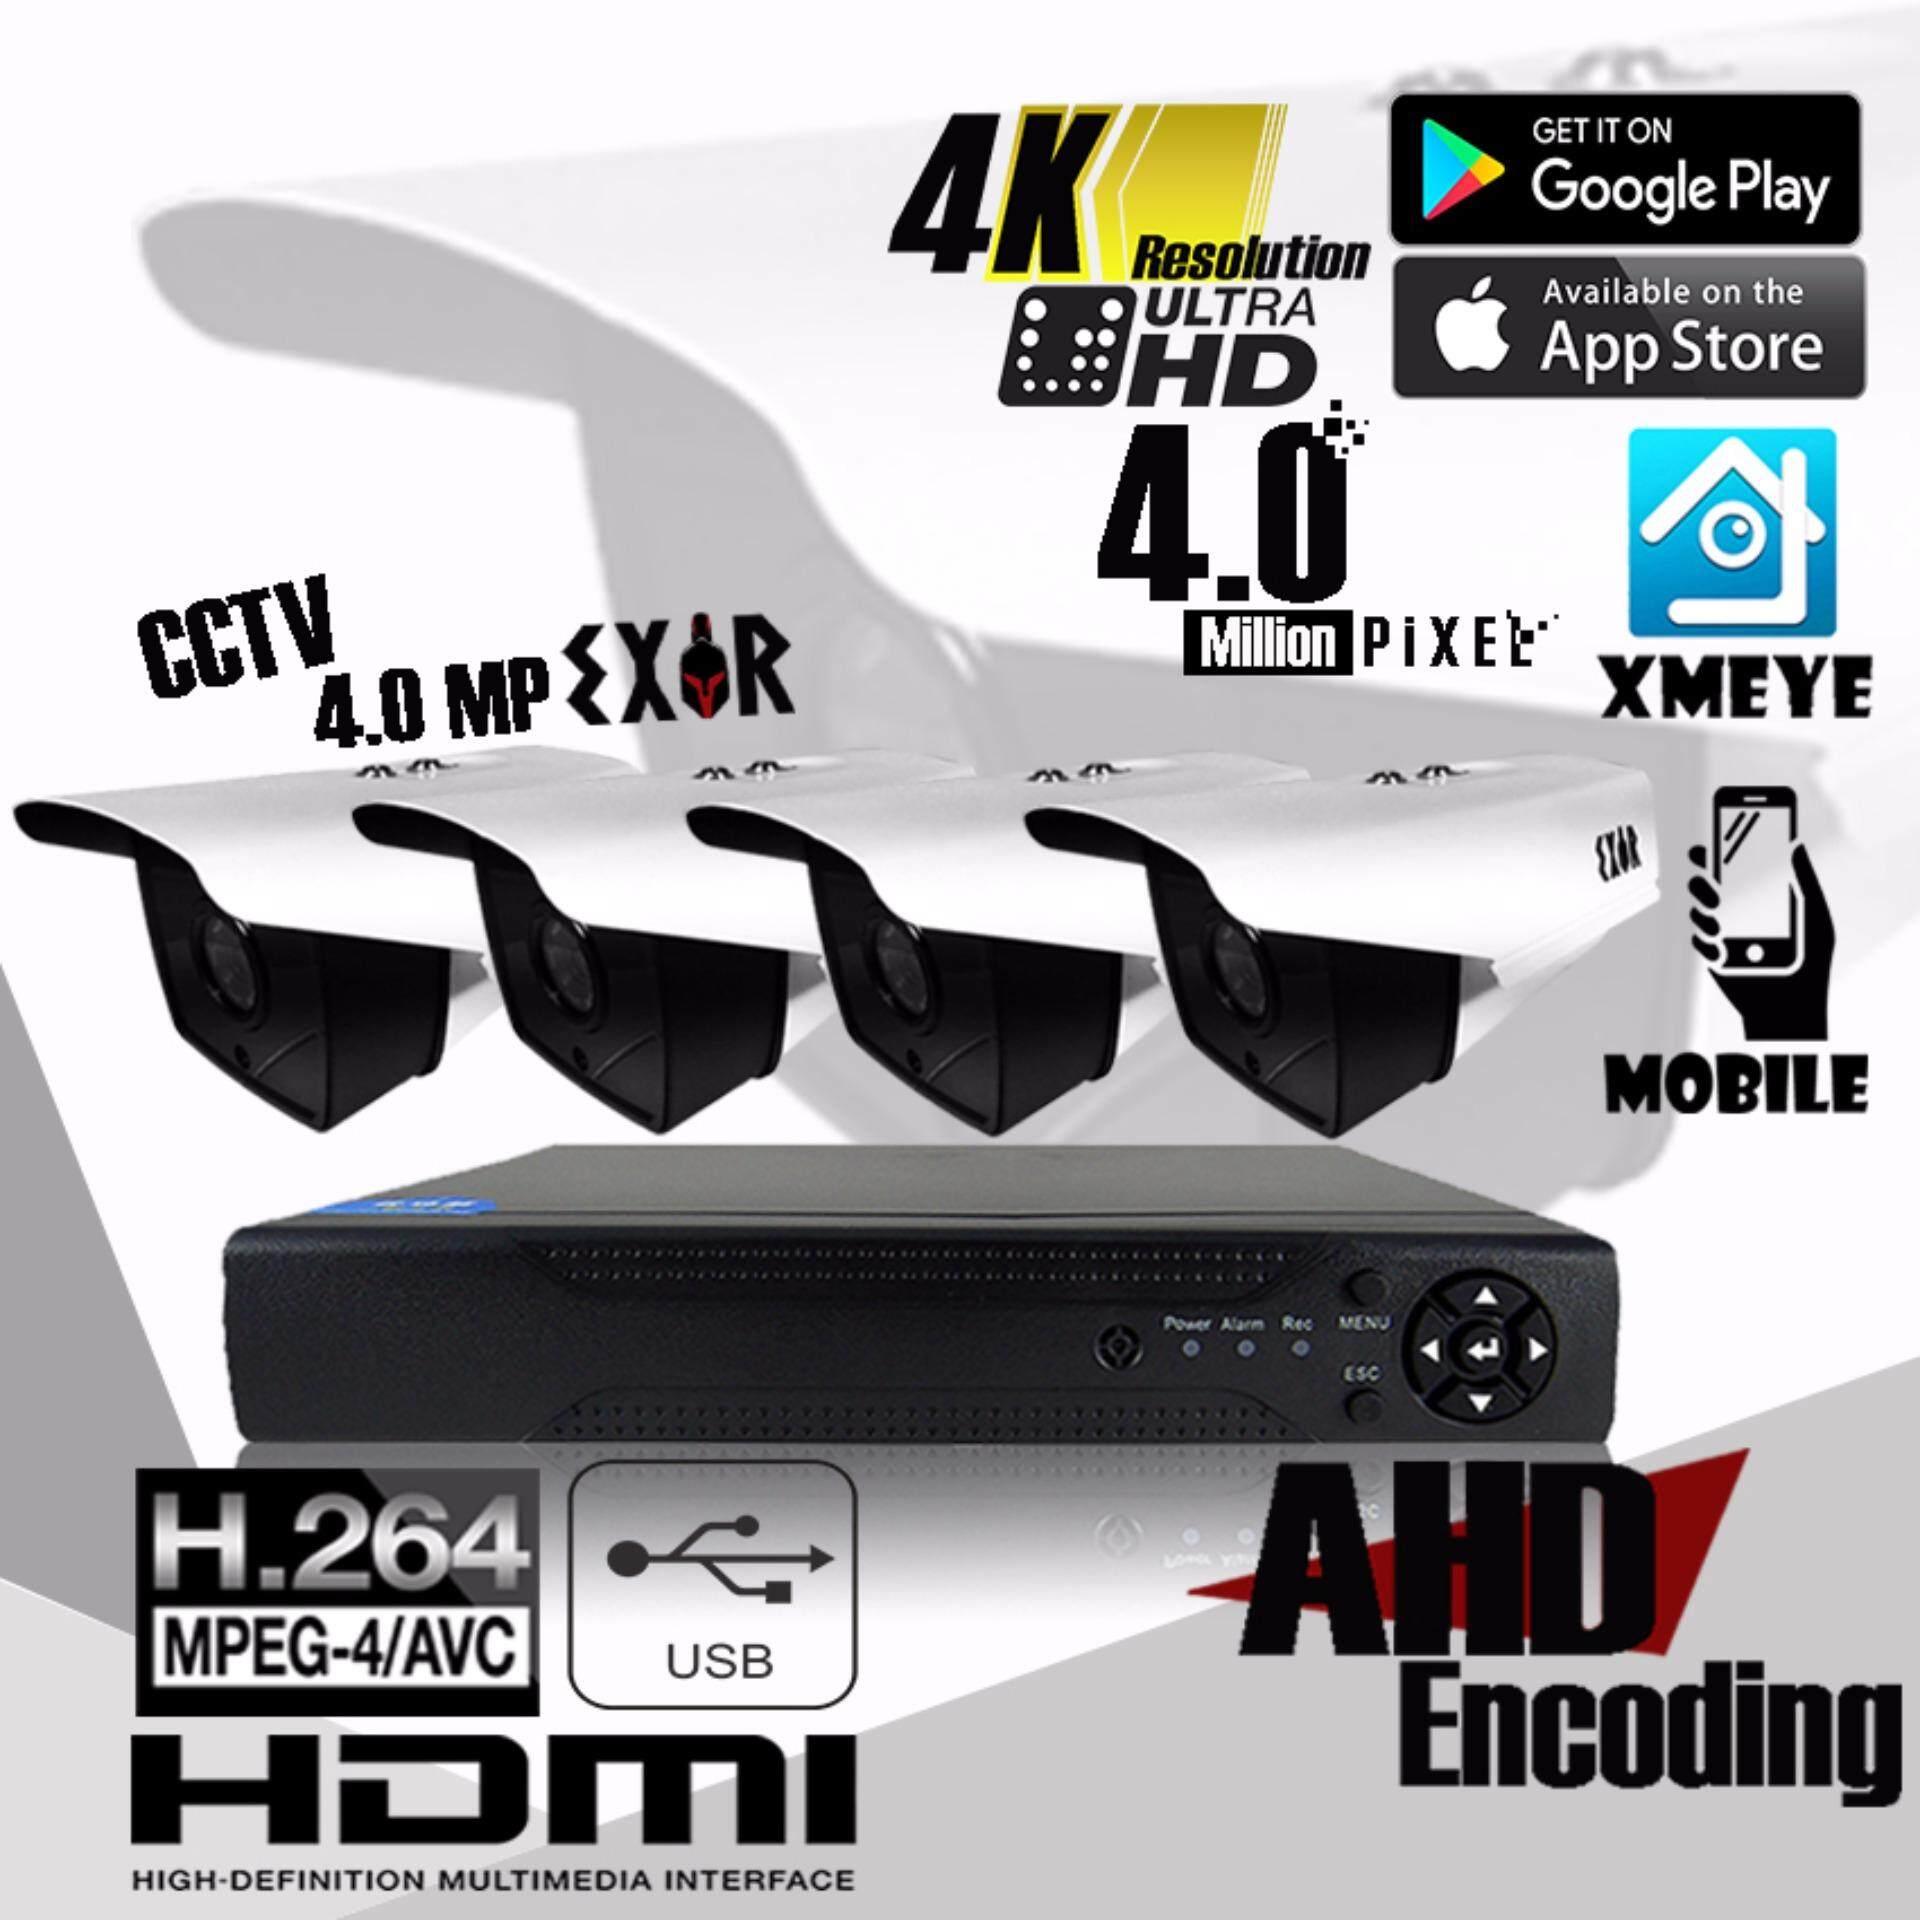 Review ชุดกล้องวงจรปิด (OEM) EXIR Ultra HD AHD CCTV Kit Set 4.0 MP. กล้อง 4 ตัว ทรงกระบอก(OEM) 4K Ultra HD / เลนส์ 4mm / Infra-red / Day & Night / Water proof และ เครื่องบันทึก DVR 4K Ultra HD 4CH + ฟรีอะแดปเตอร์ ฟรีขายึดกล้อง ลดล้างสต๊อก